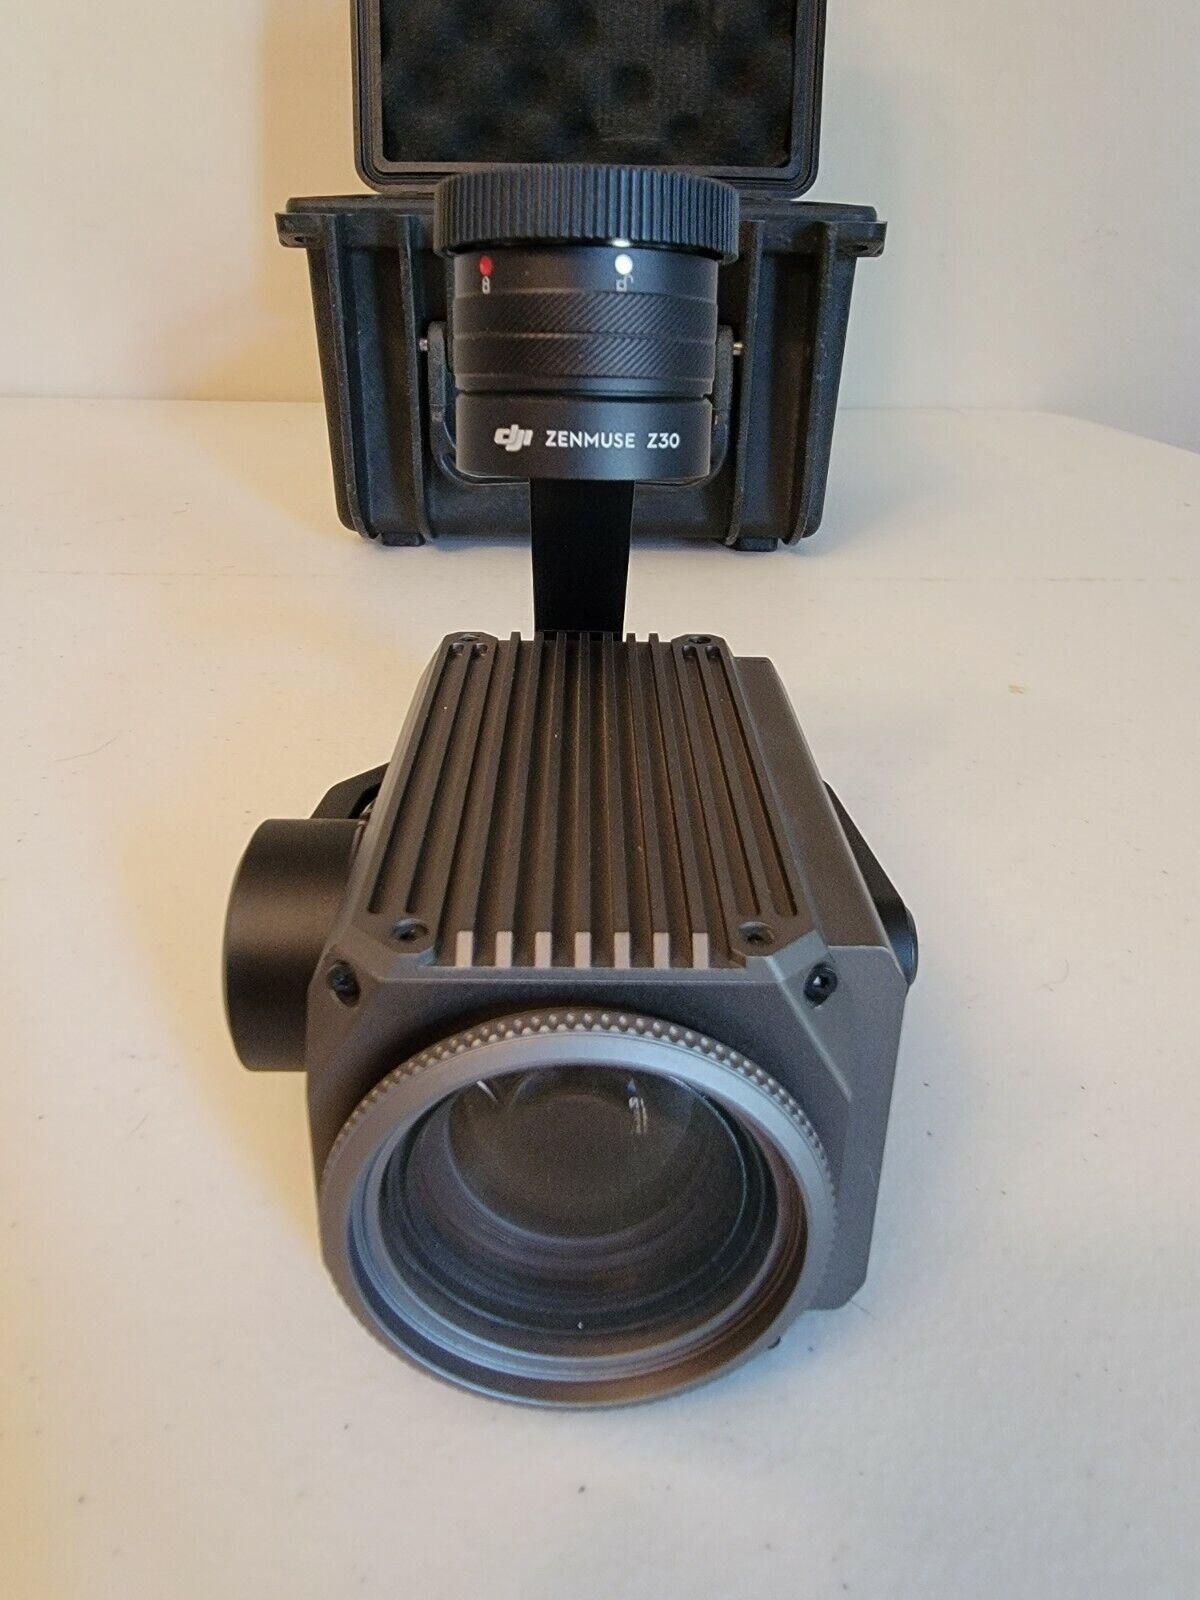 DJI Zenmuse Z30 30X Optical Zoom Gimbal Camera